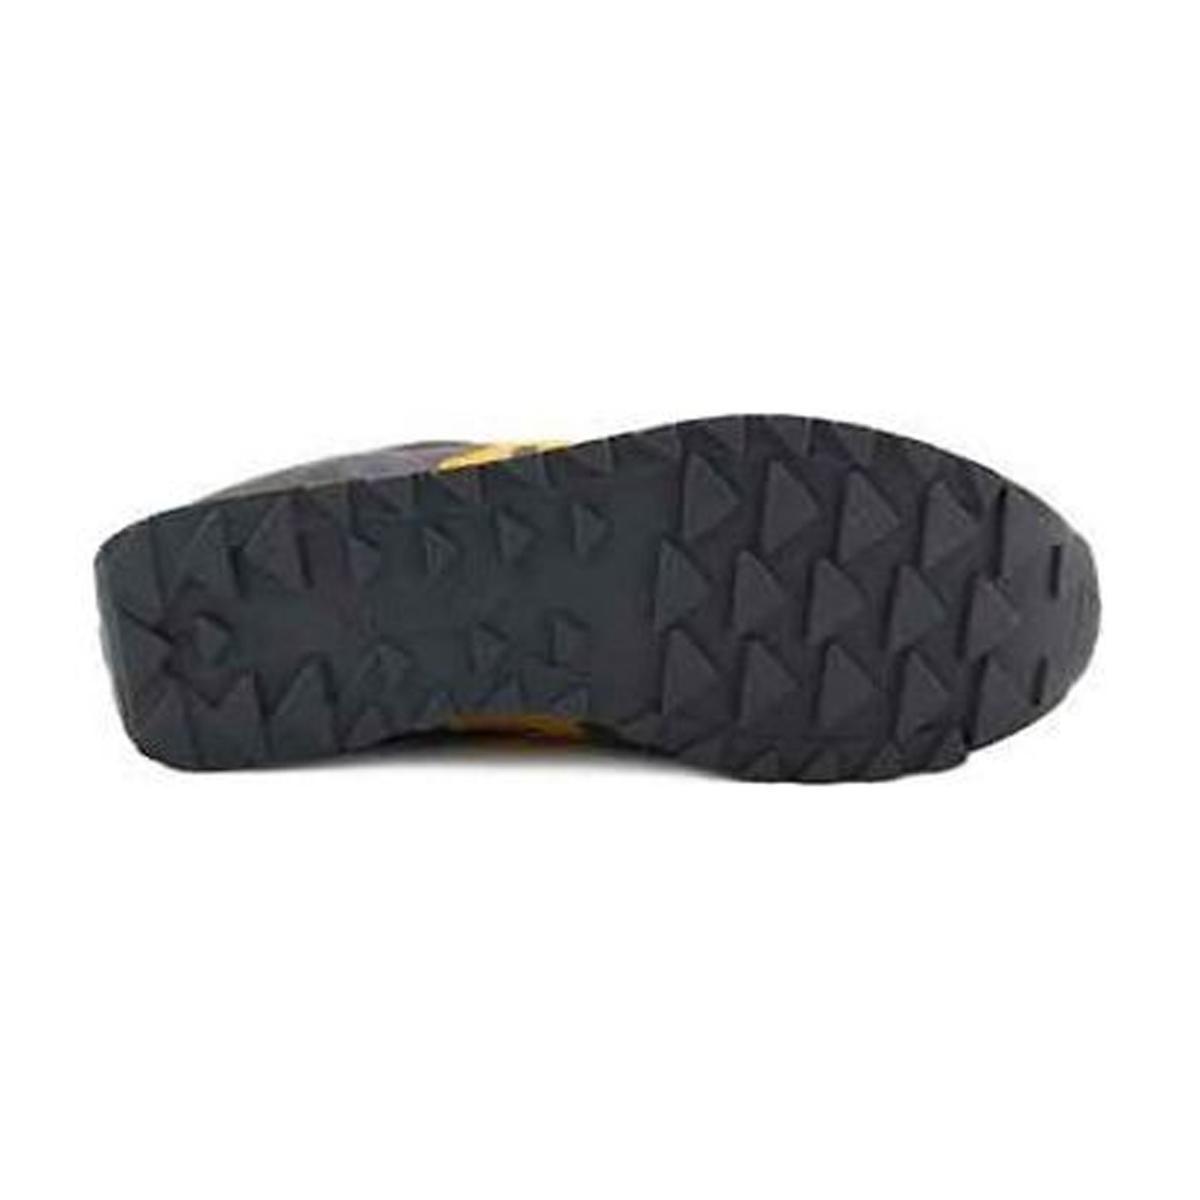 Scarpe Sneakers Saucony Jazz Original da uomo rif. S2044-417